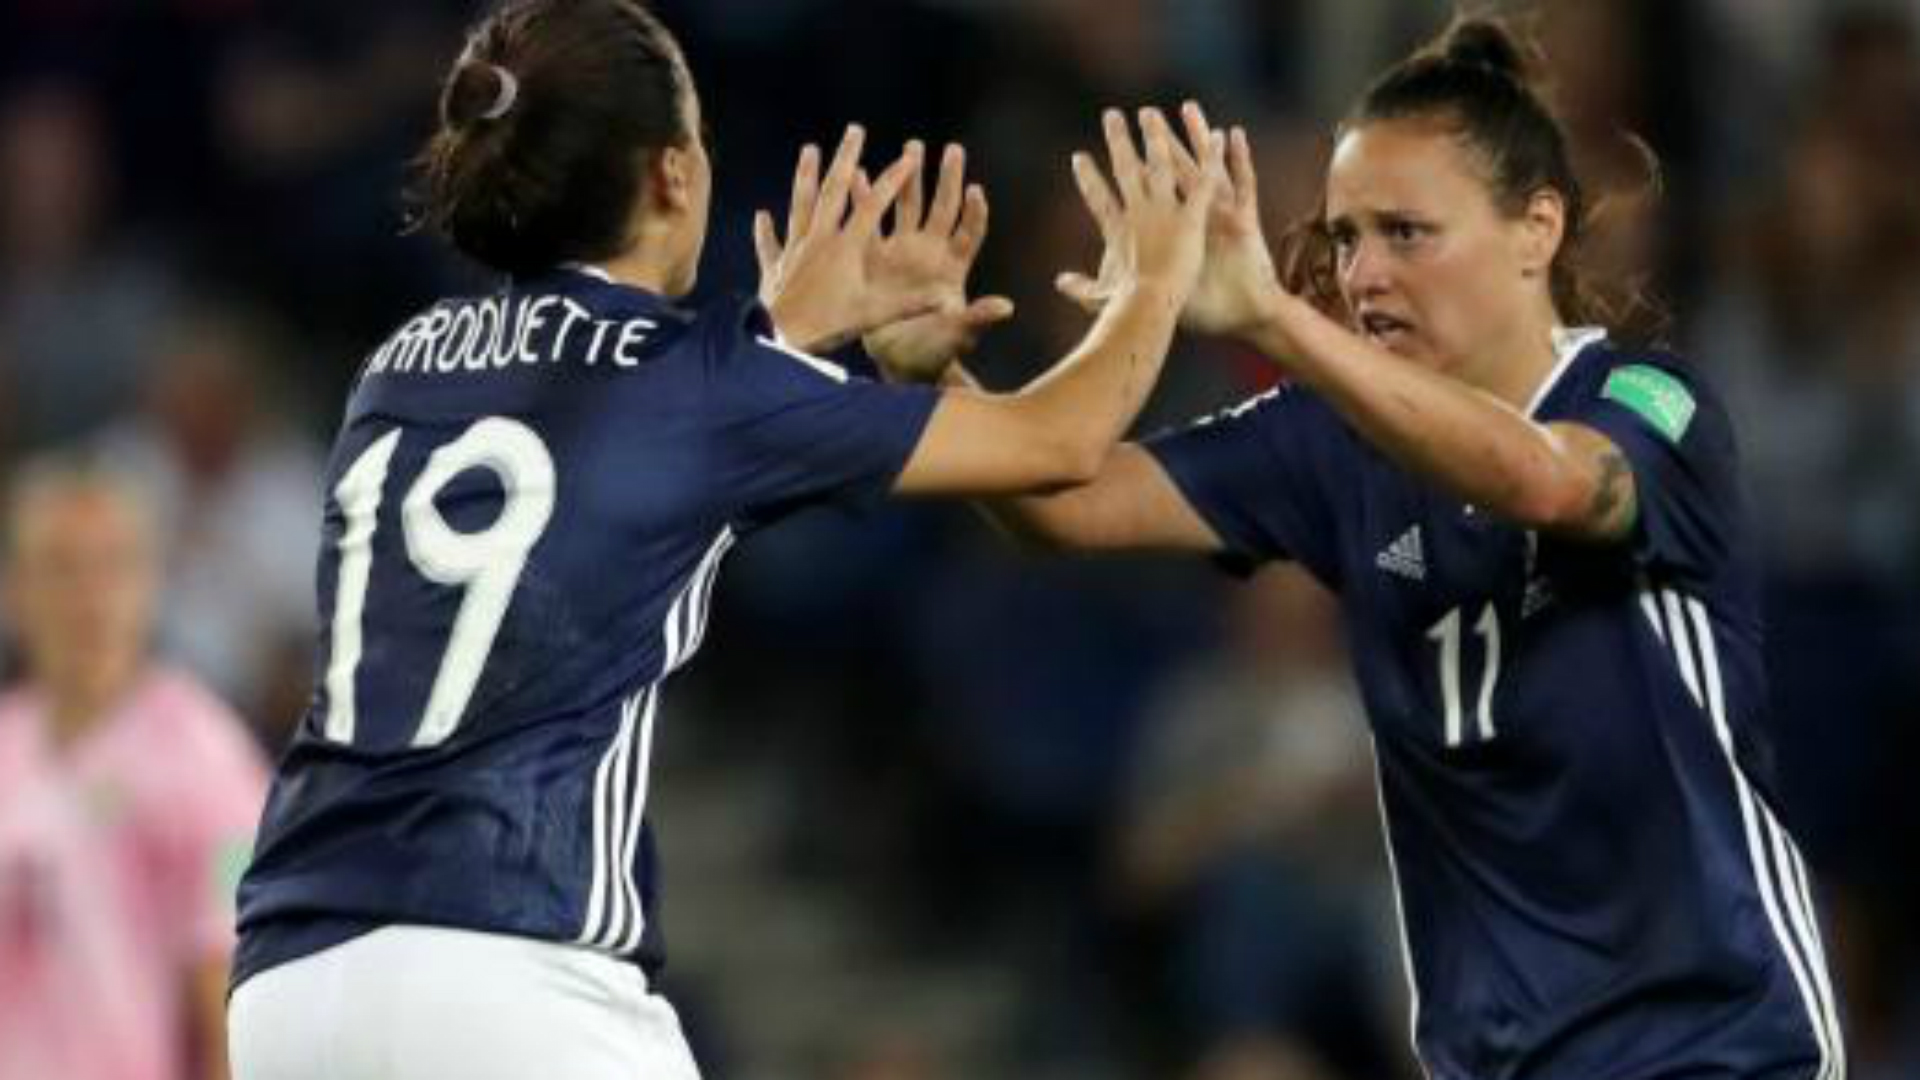 Women's World Cup 2019: Argentina's sensational comeback knocks out Scotland